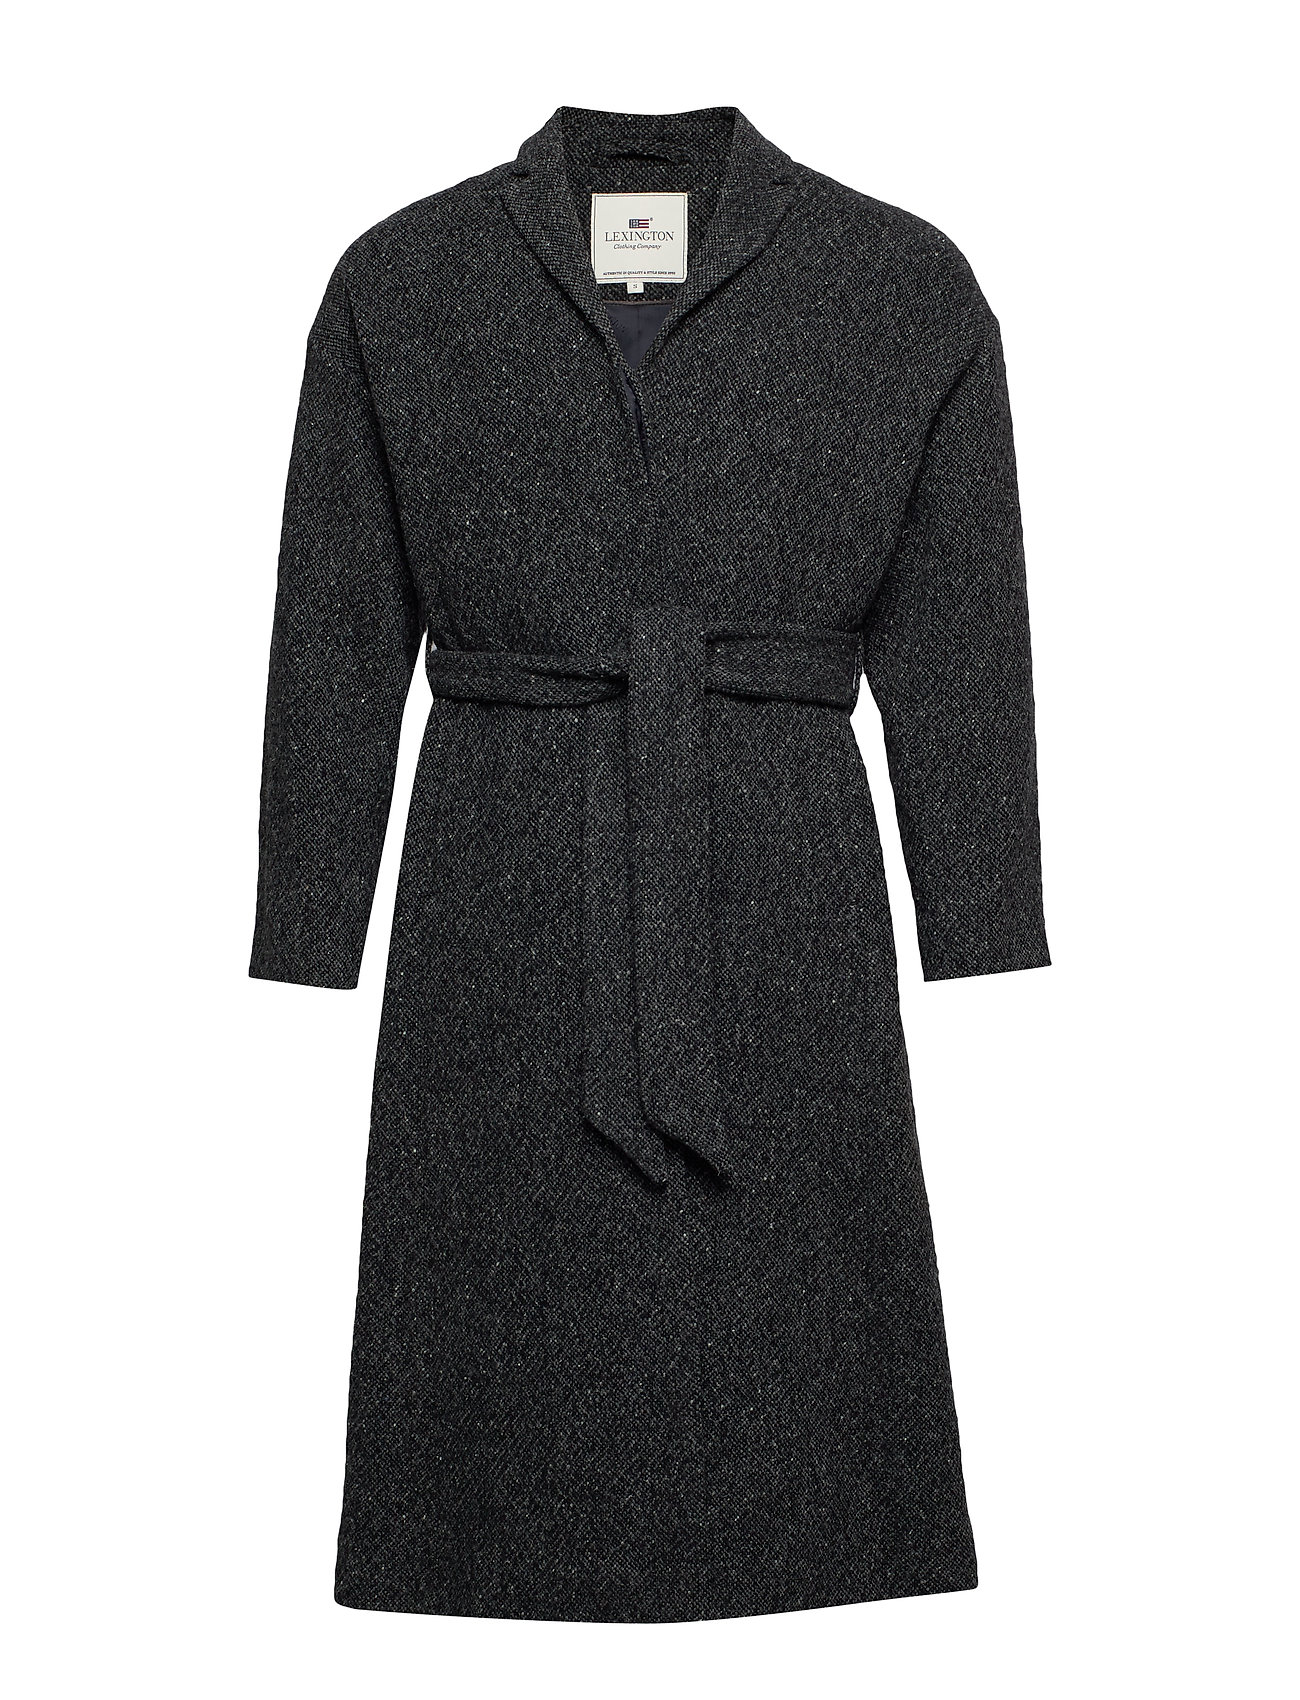 Lexington Clothing Alice Wool Coat - DARK GRAY MELANGE